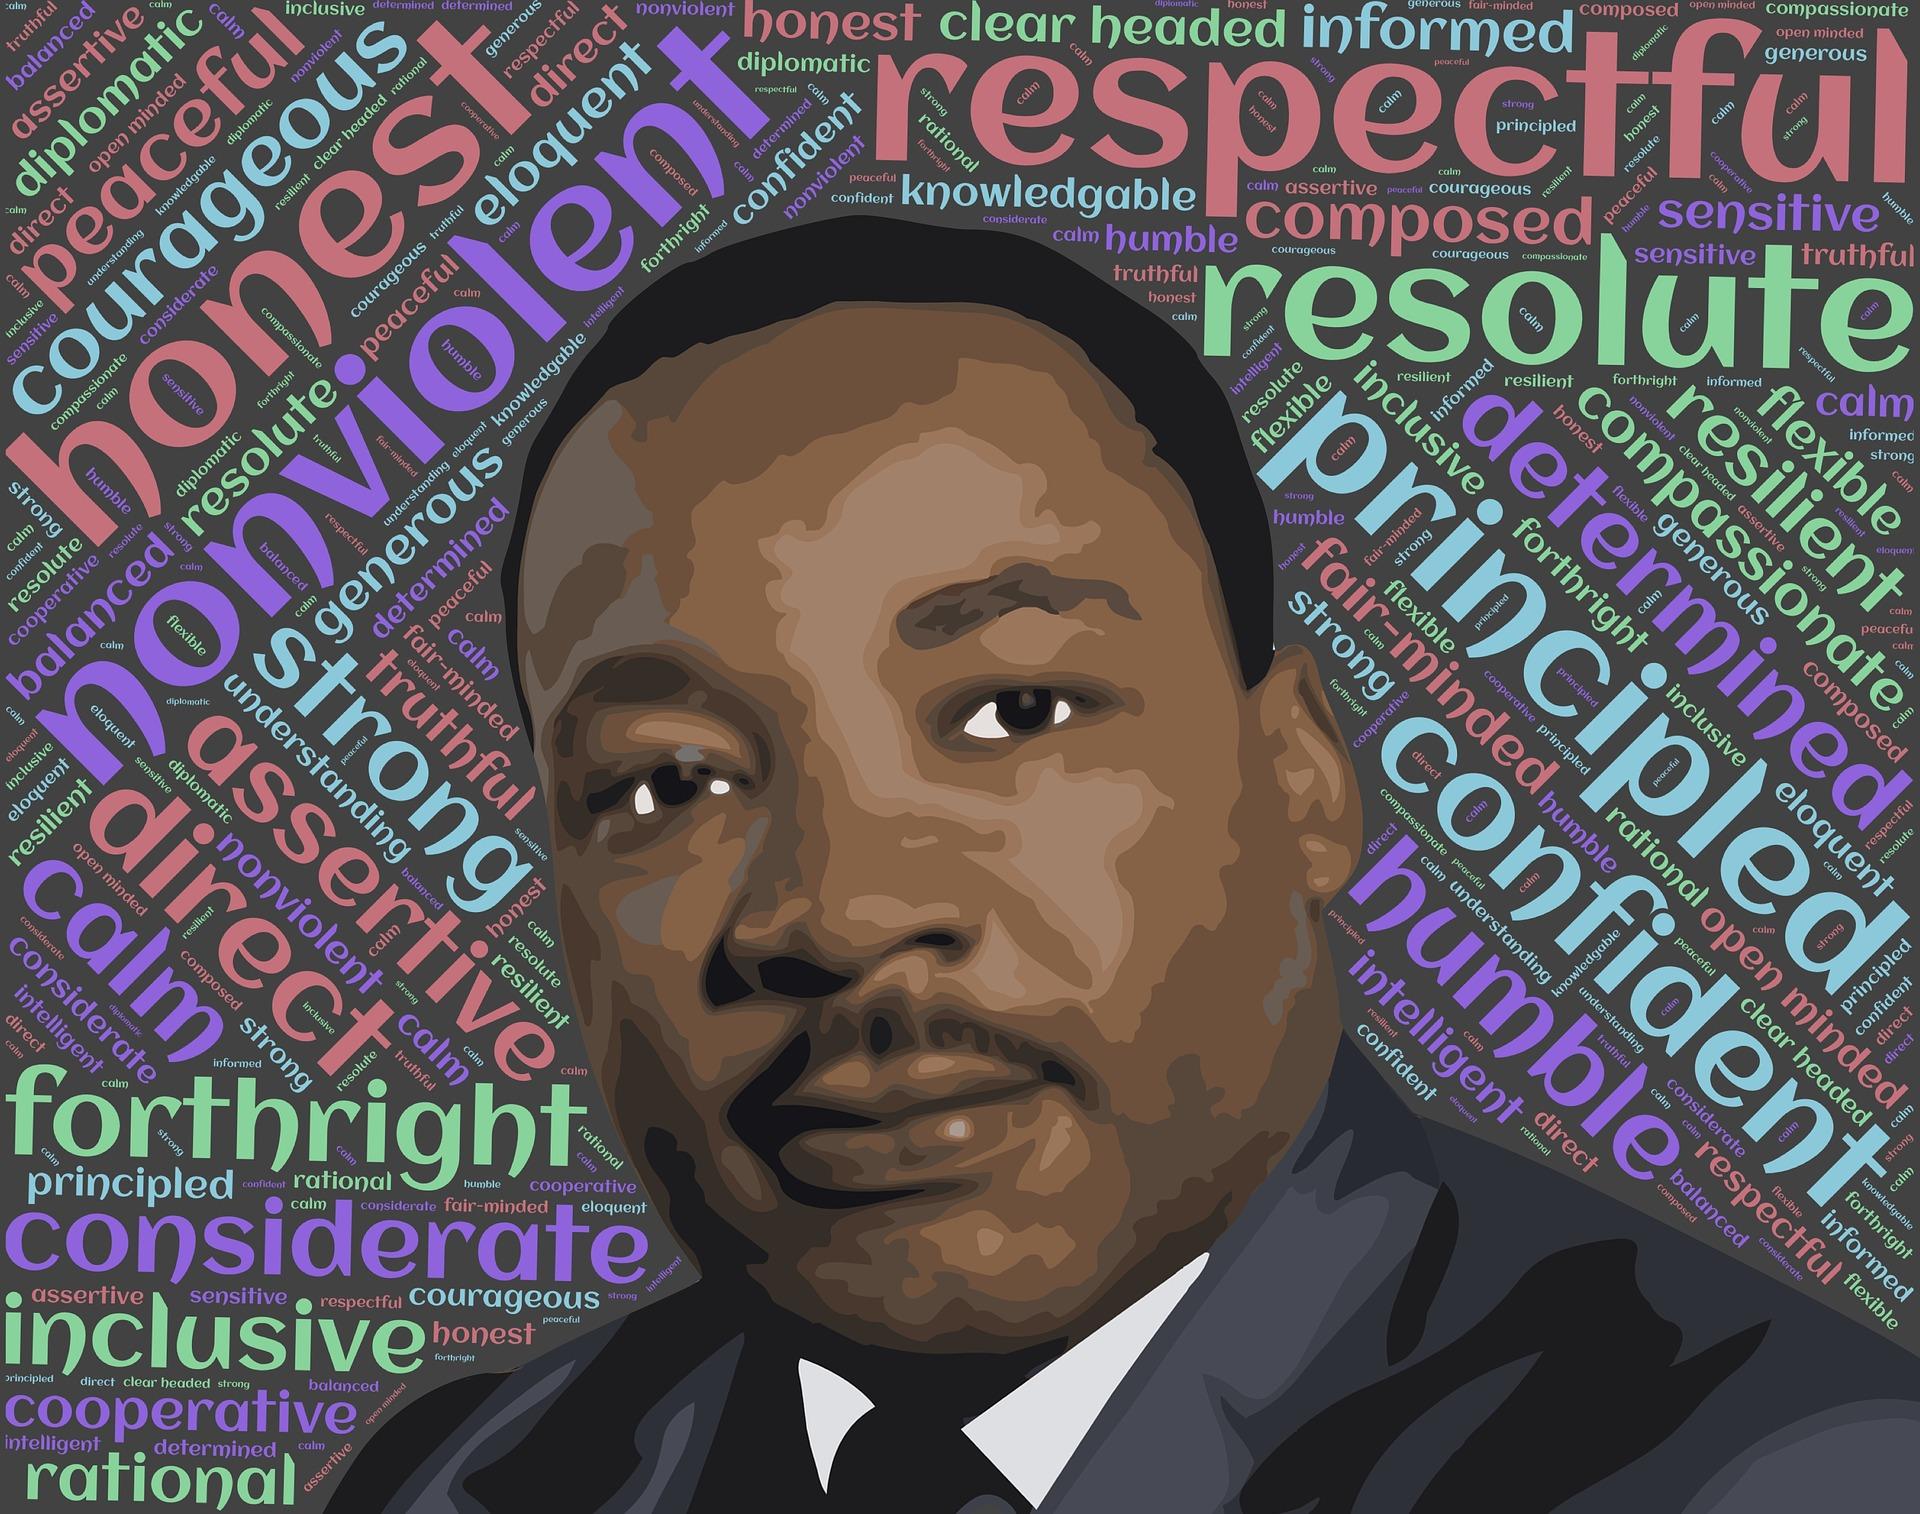 Dr. Martin Luther King, Jr.